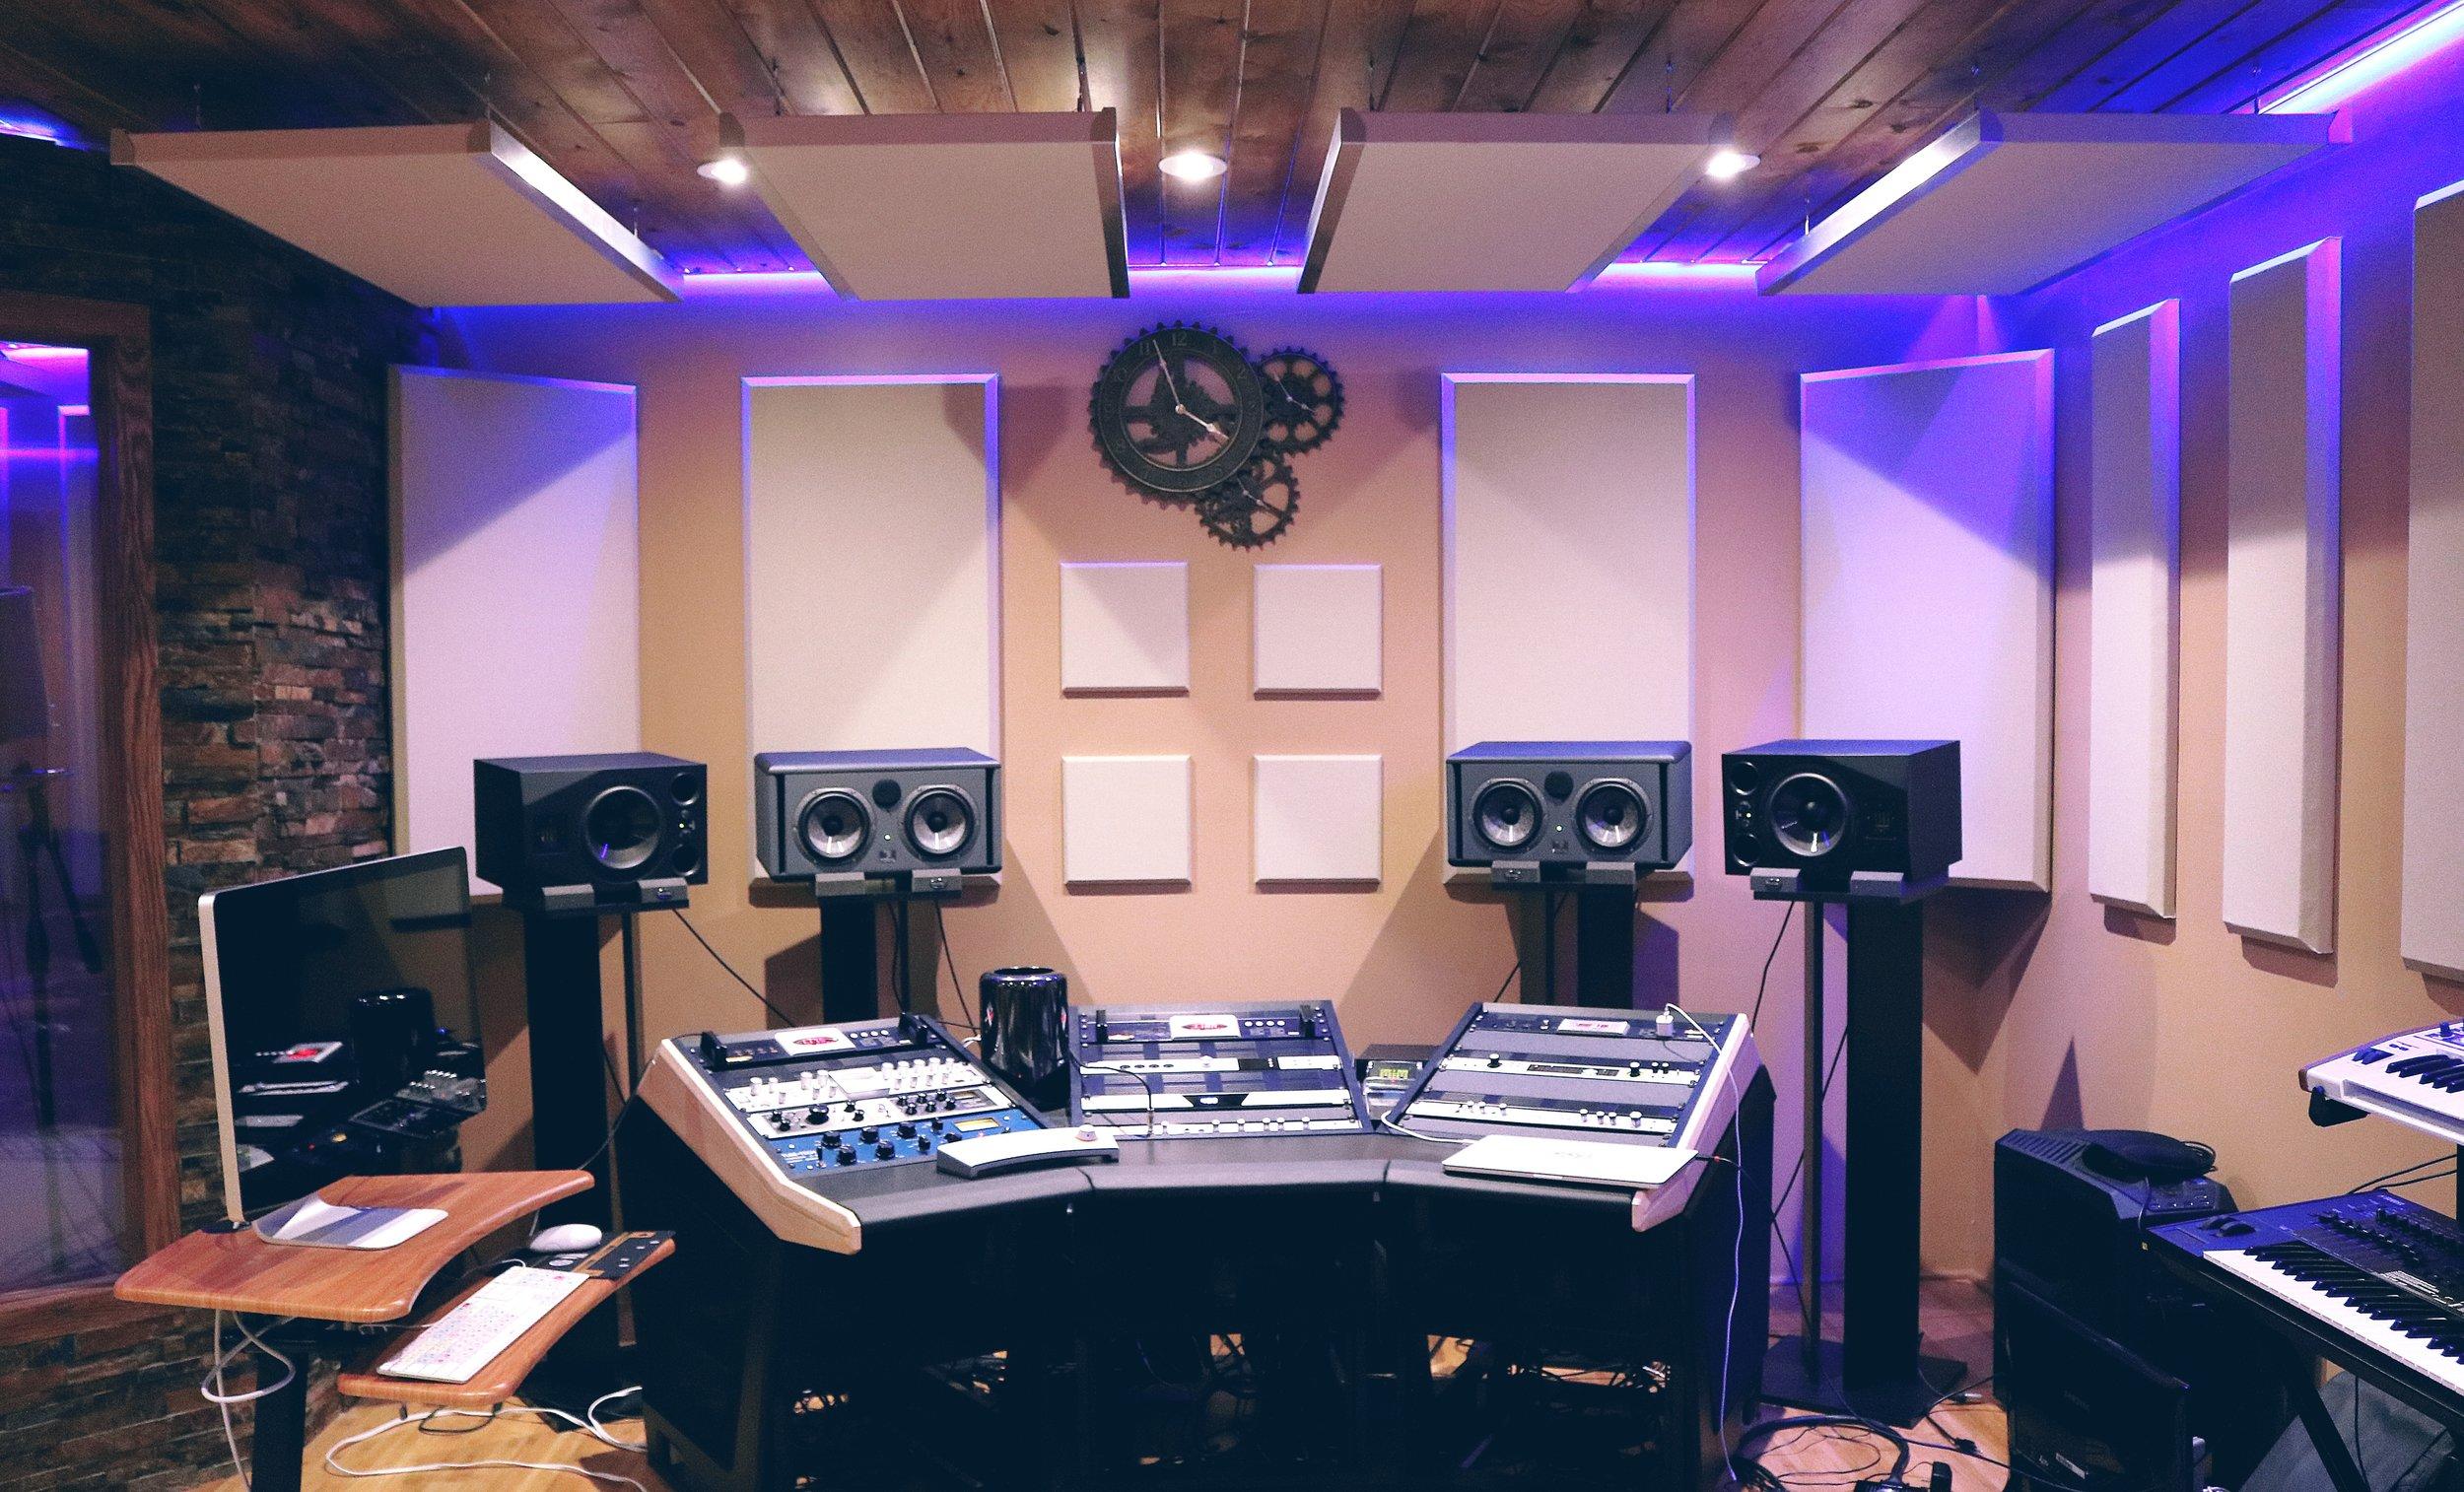 recording-studio-pexels-photo-164938.jpeg